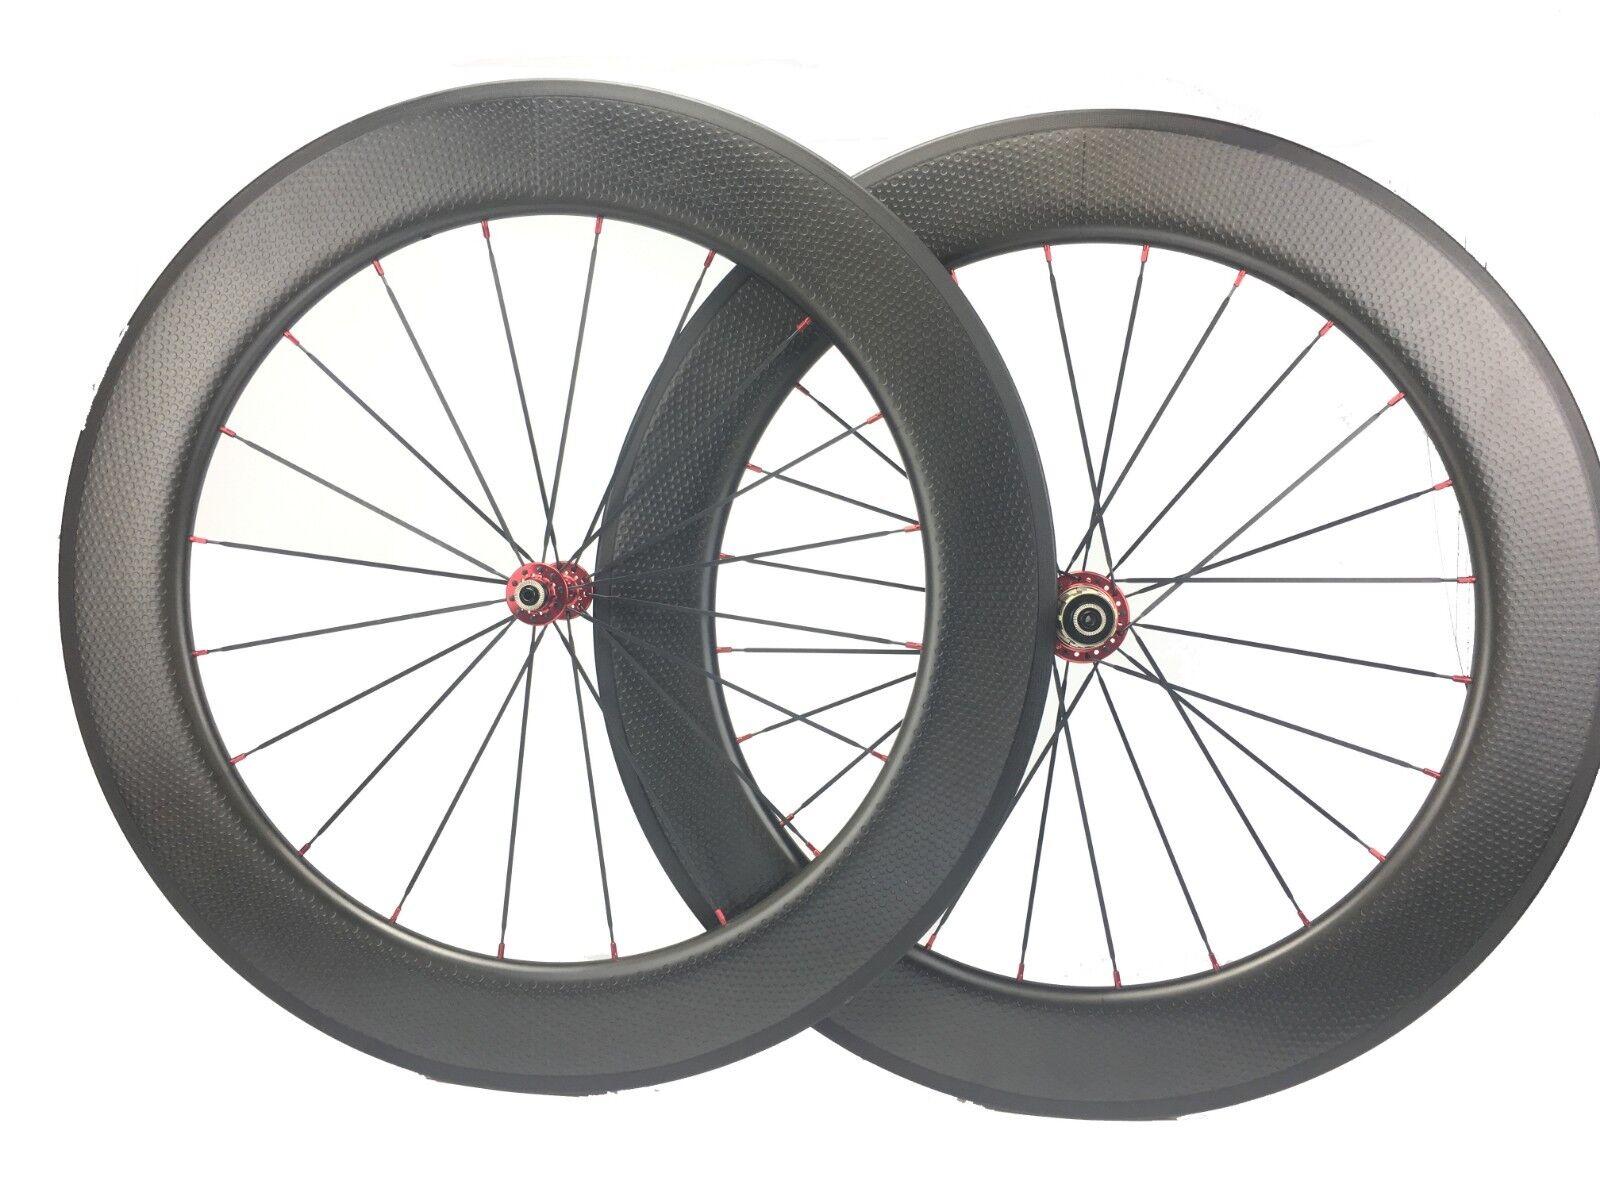 80mm  Dimple Carbon Wheels 700C Carbon Road Bike Wheel 1420 424 Aero Spokes 700C